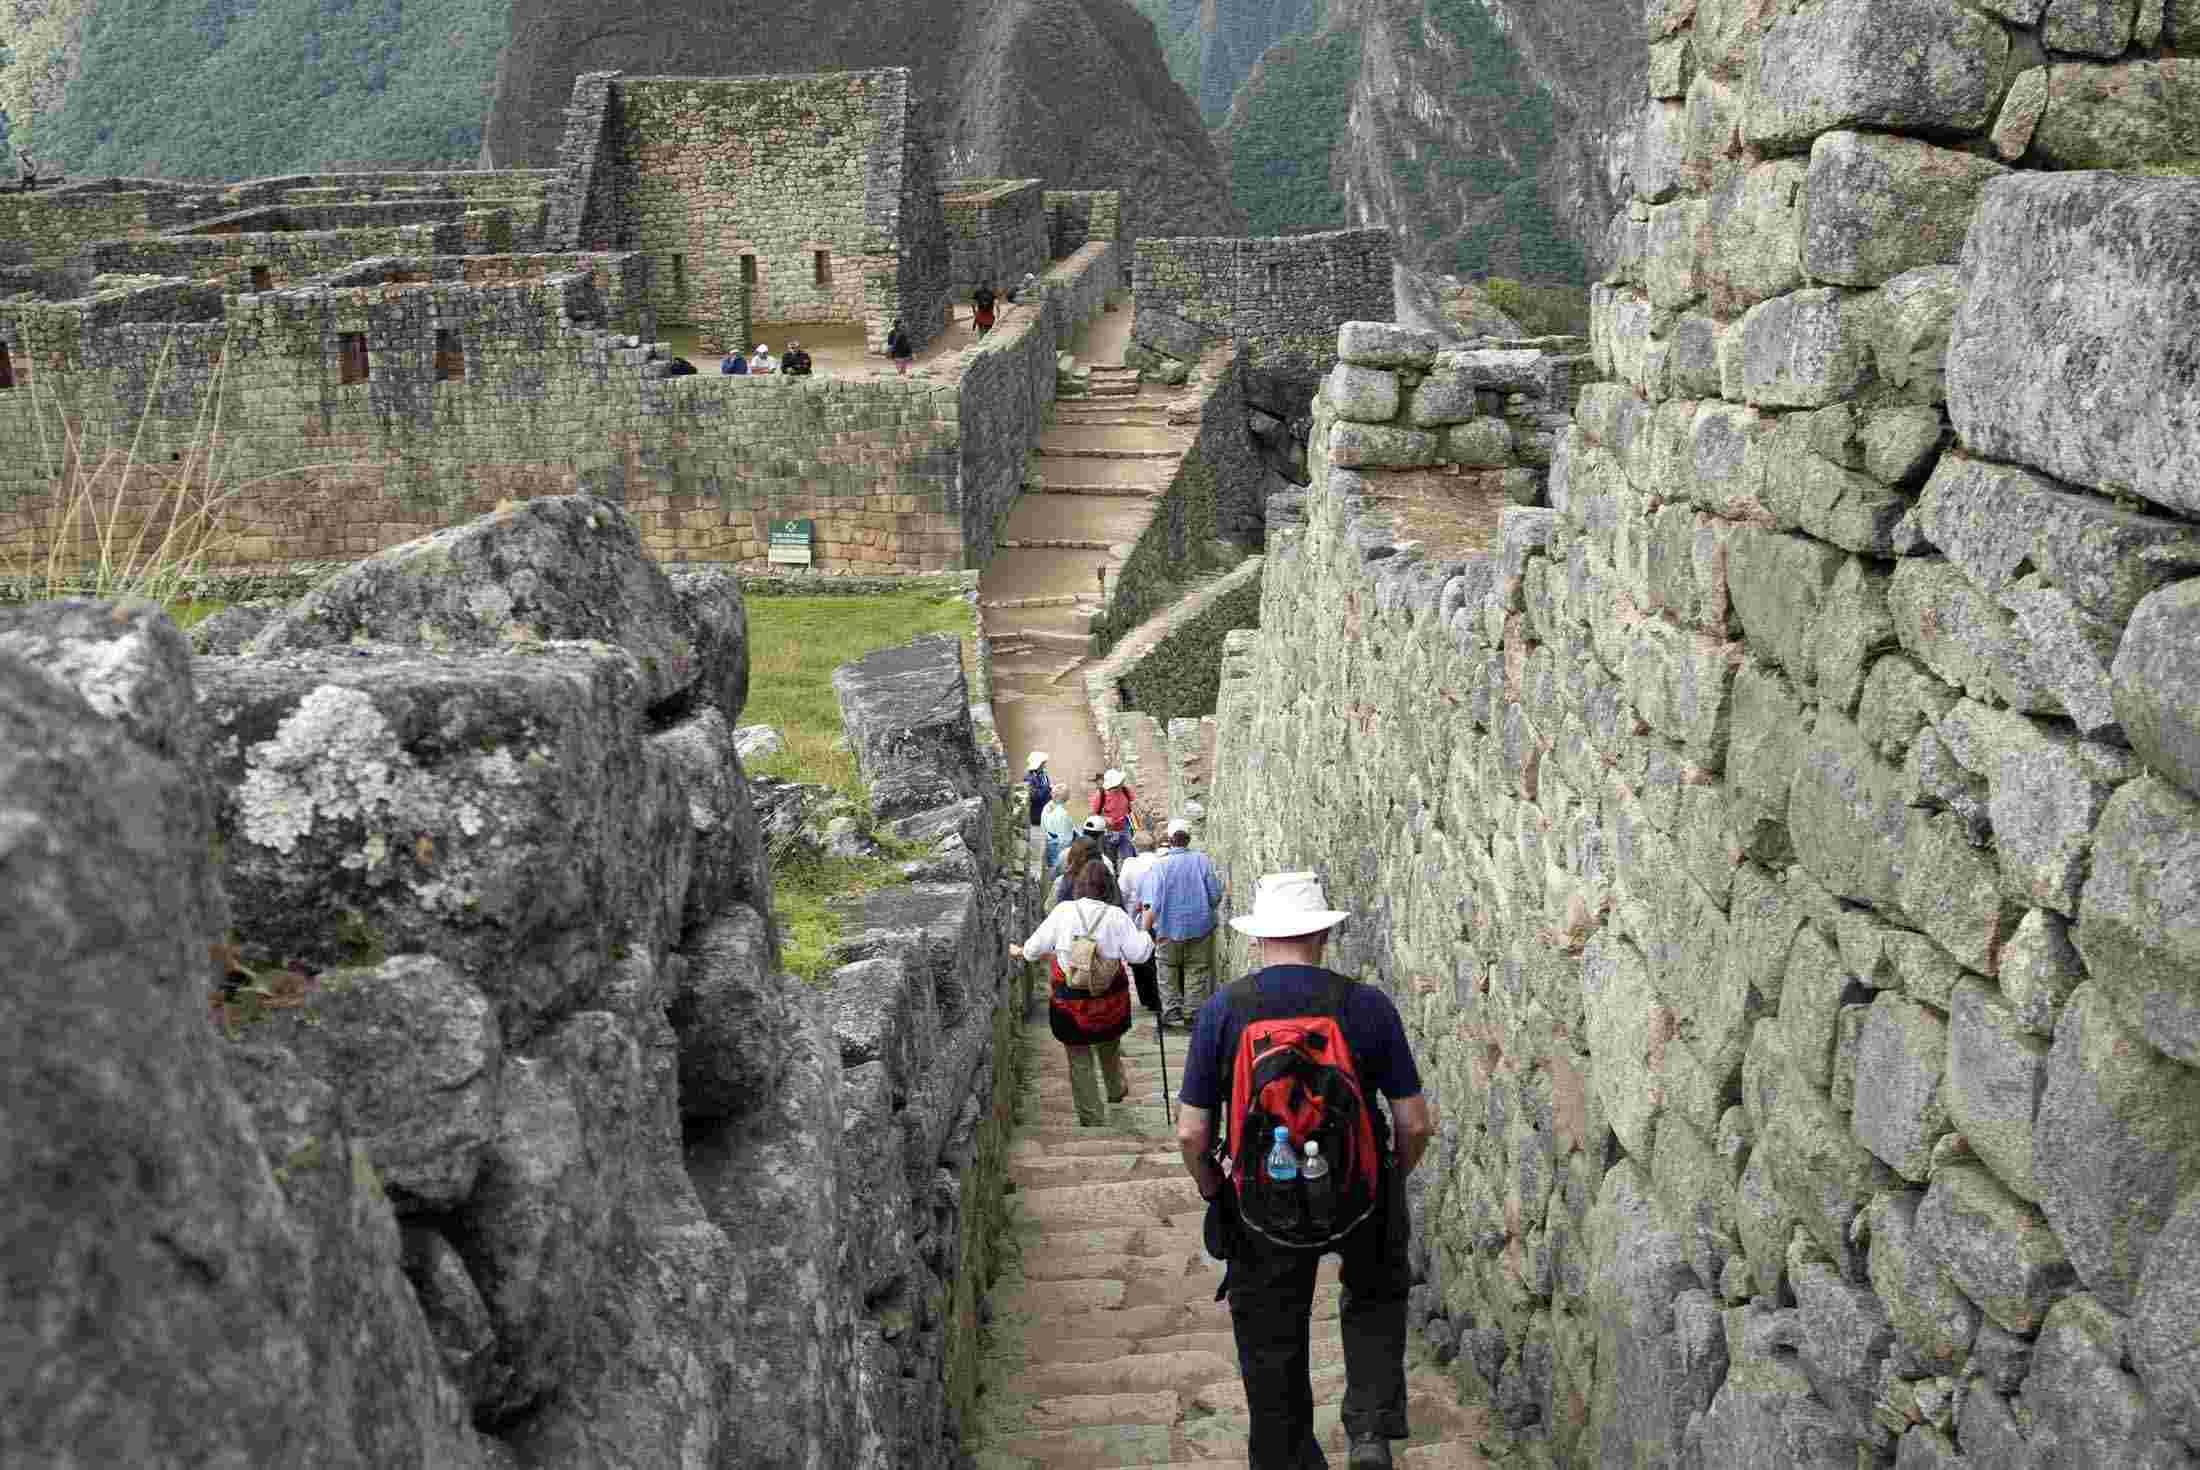 Salkantay, Inca Trail, Machu Picchu - Salkantay Trekking Inca trail photo gallery